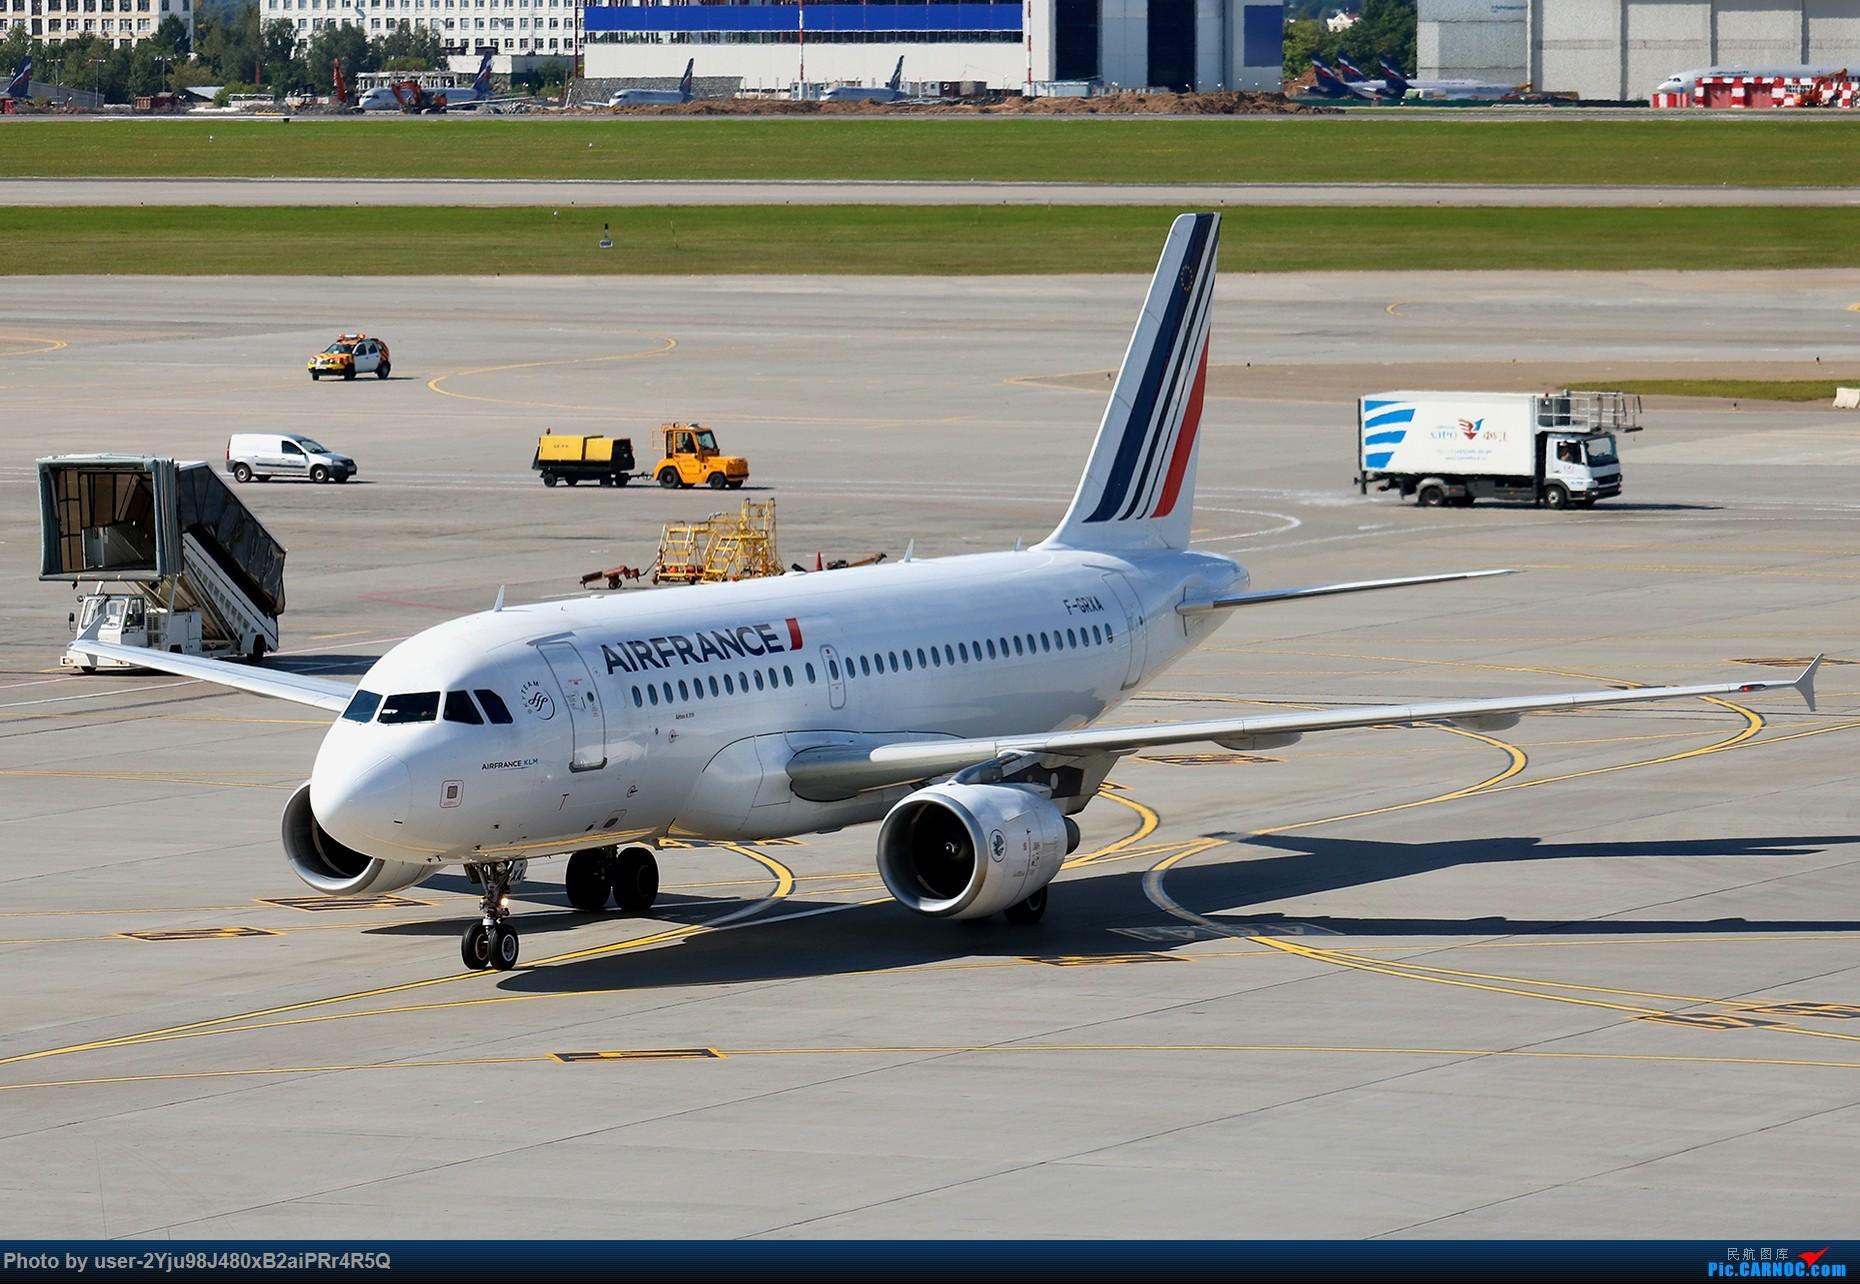 Re:[原创]LIULIU|Sheremetyevo的漫游|其他篇 AIRBUS A319-111 F-GRXA 俄罗斯谢诺梅杰沃机场